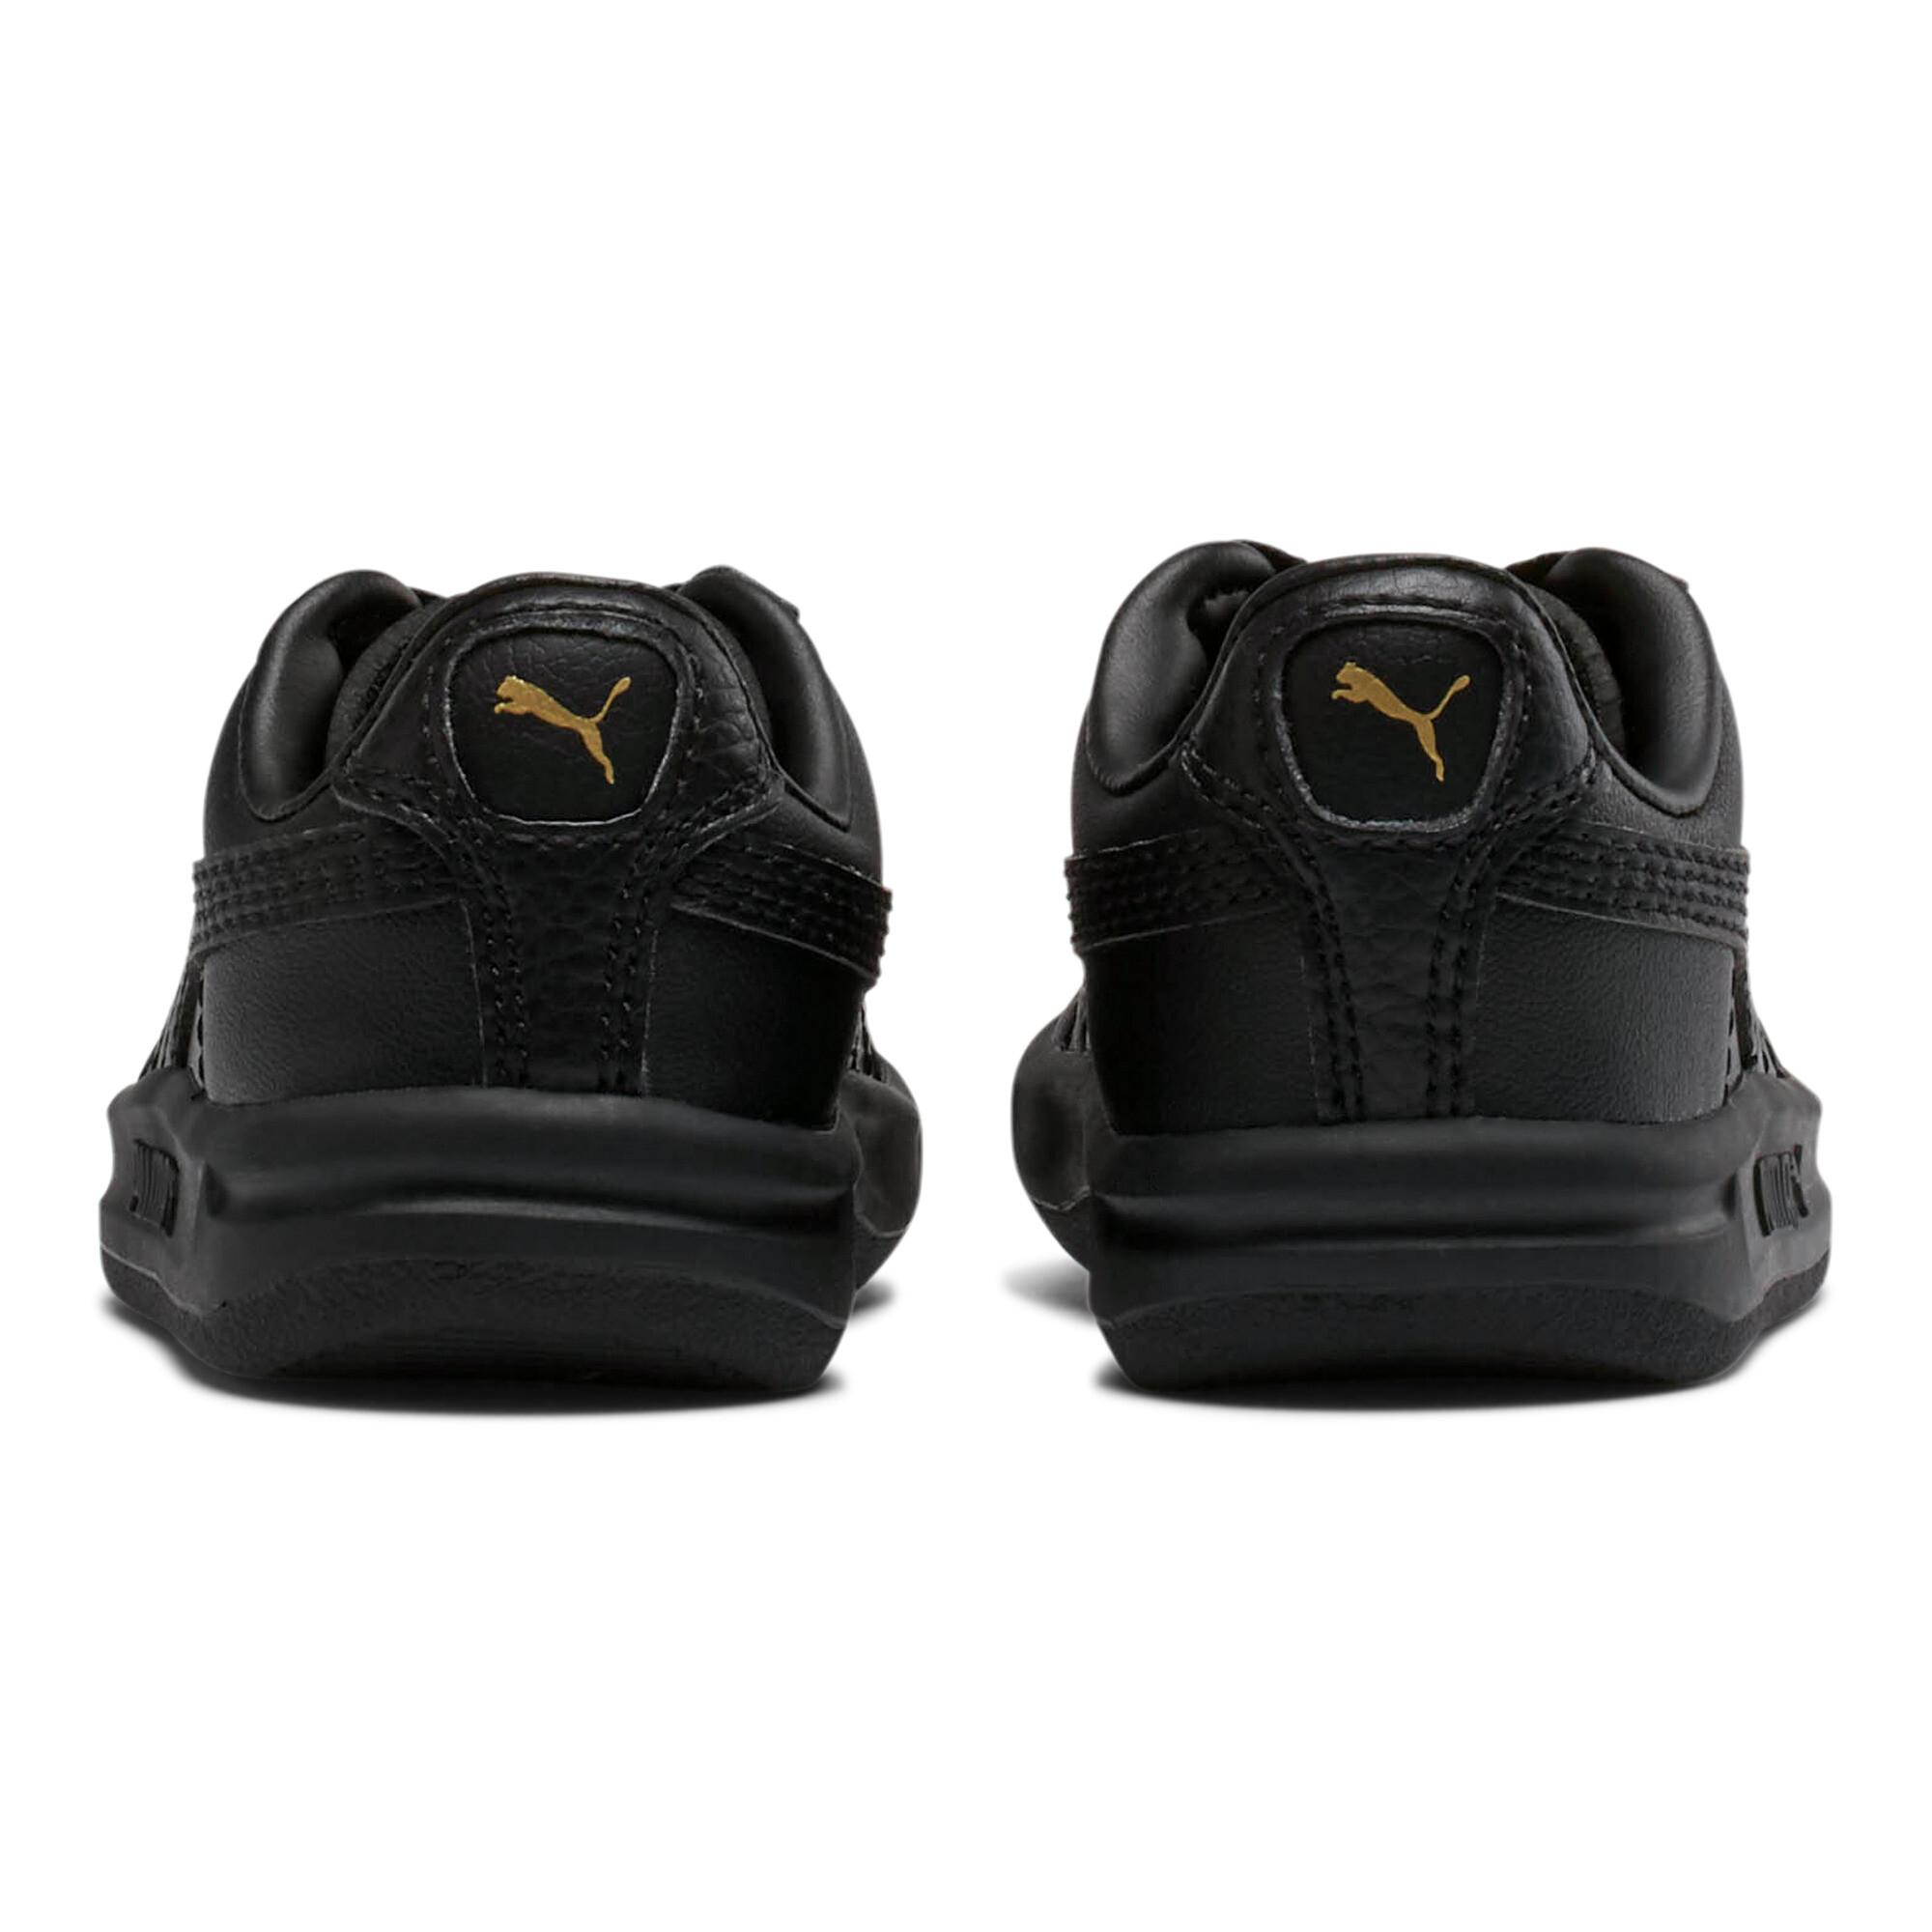 PUMA-Infant-GV-Special-Shoes thumbnail 20